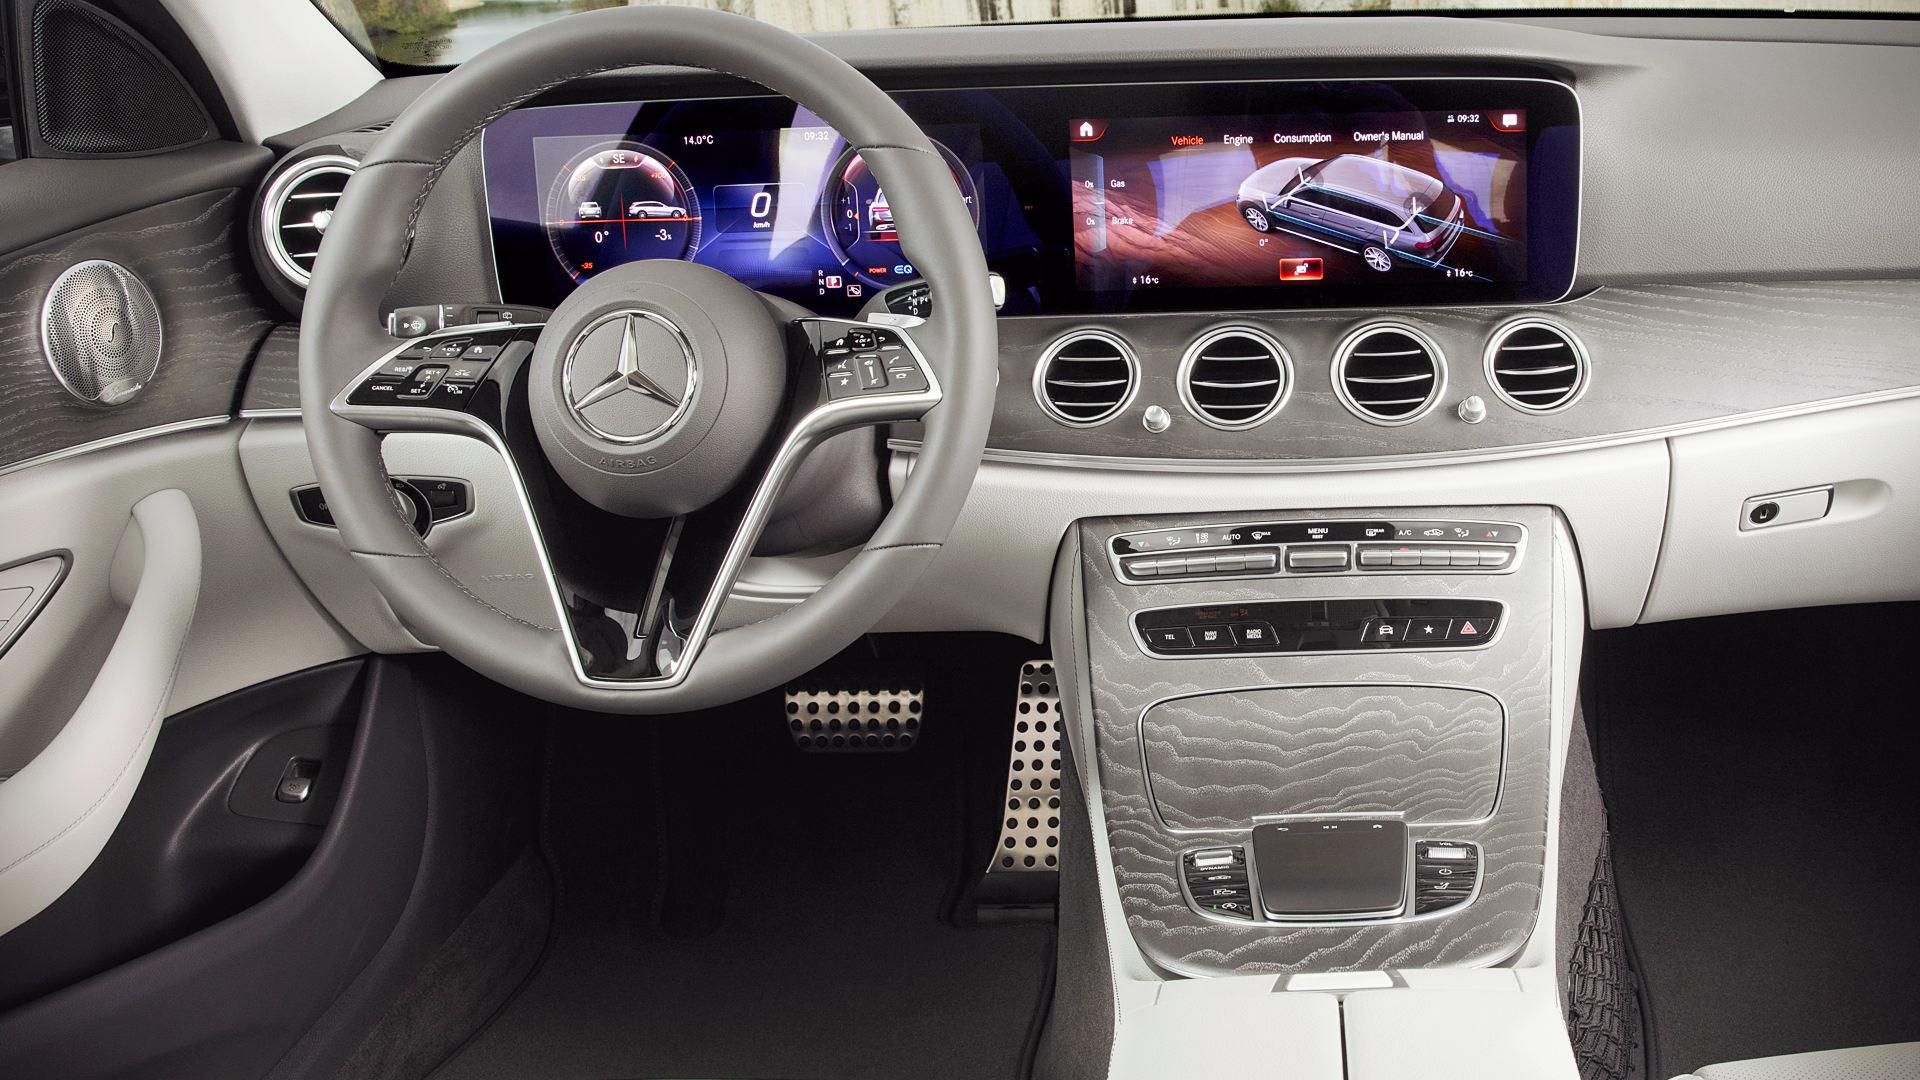 Mercedes Benz E-Class 350  2021 Interior Wallpaper